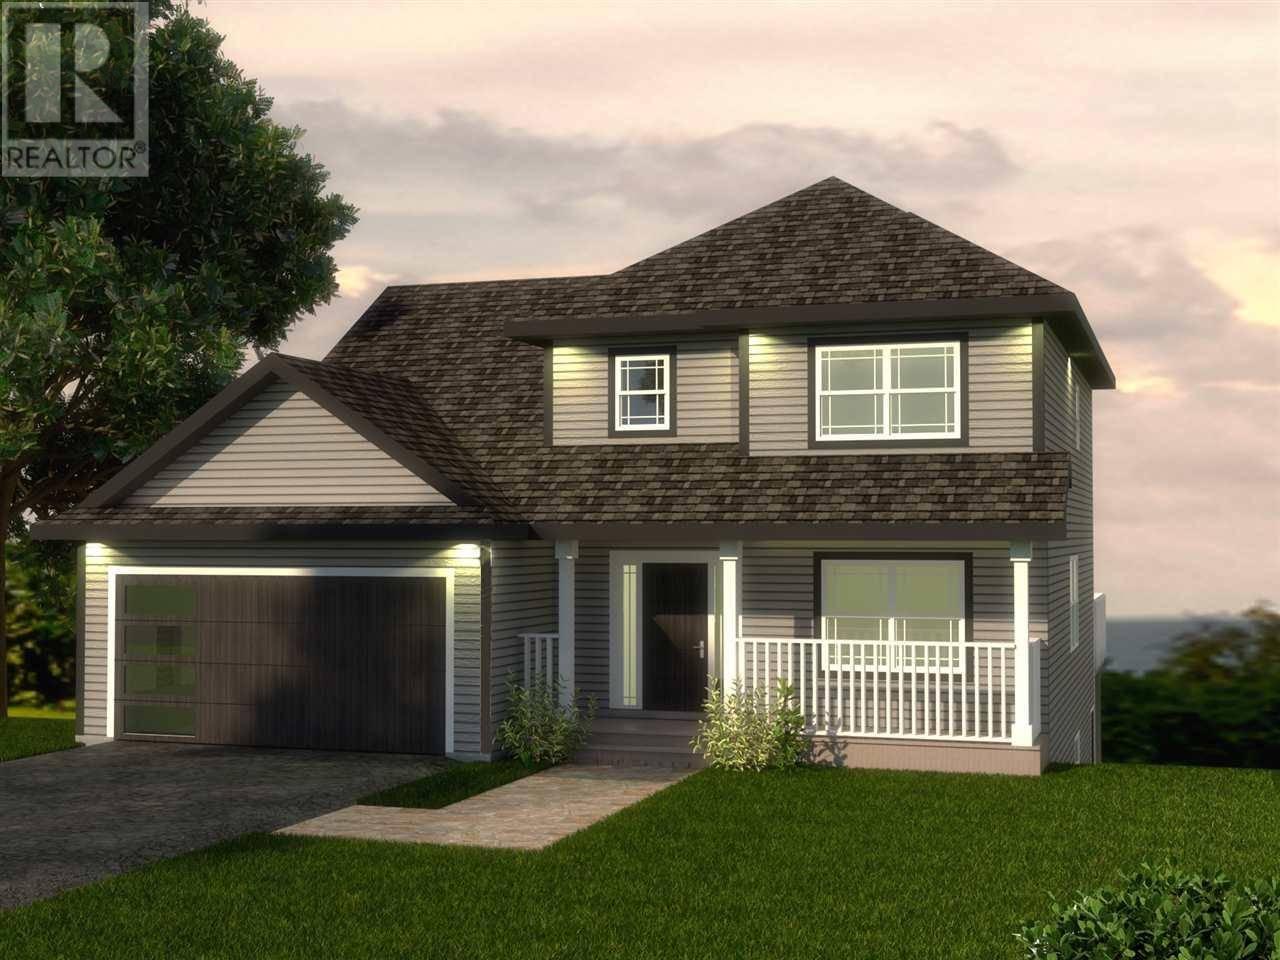 House for sale at 348 Gallloway Dr Unit 602 Beaver Bank Nova Scotia - MLS: 202002452